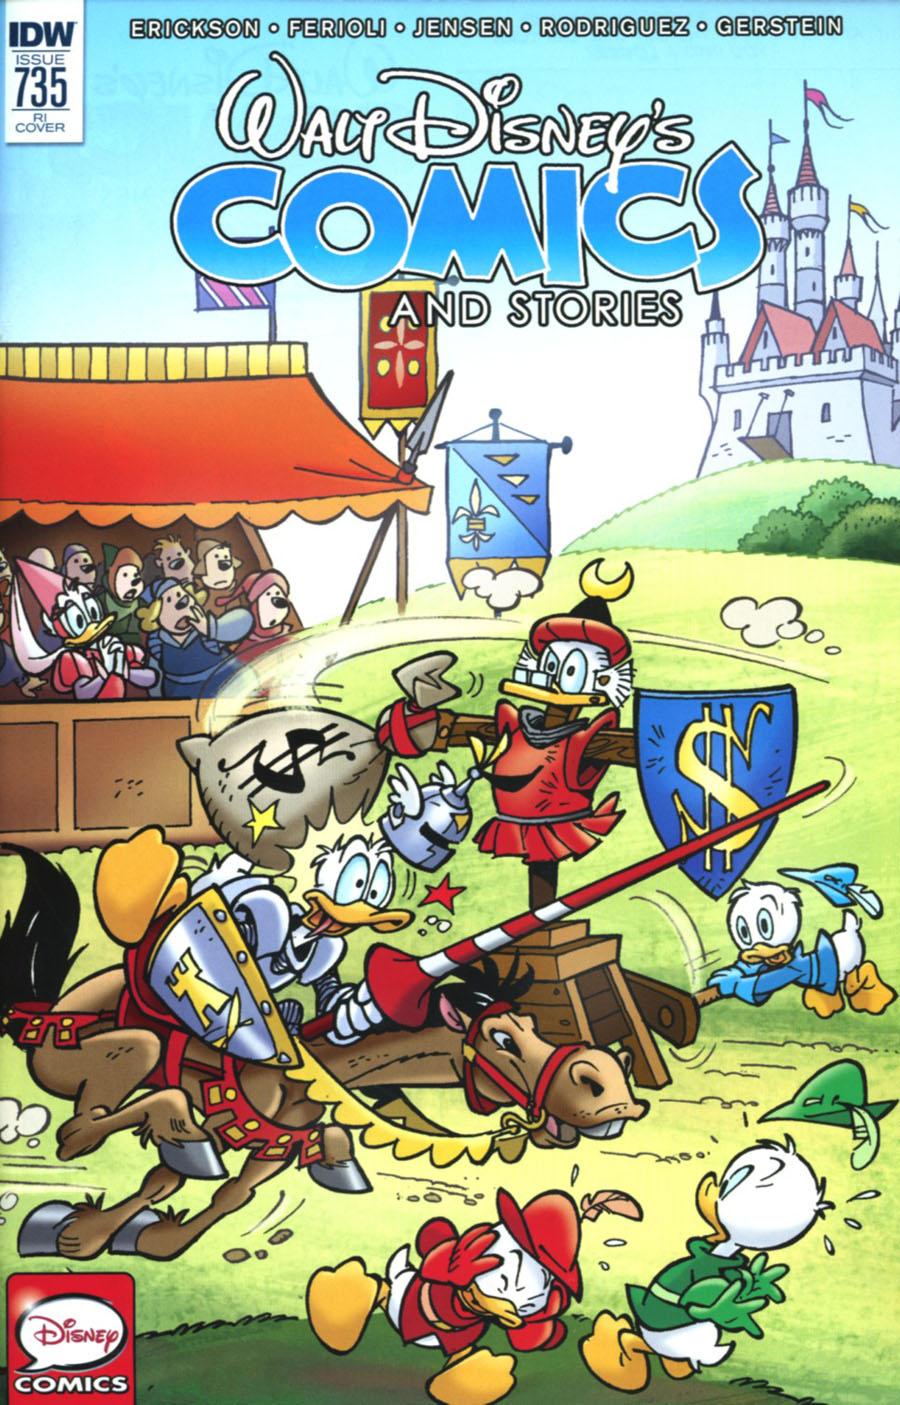 Walt Disneys Comics & Stories #735 Cover C Incentive Massimo Fecchi Variant Cover